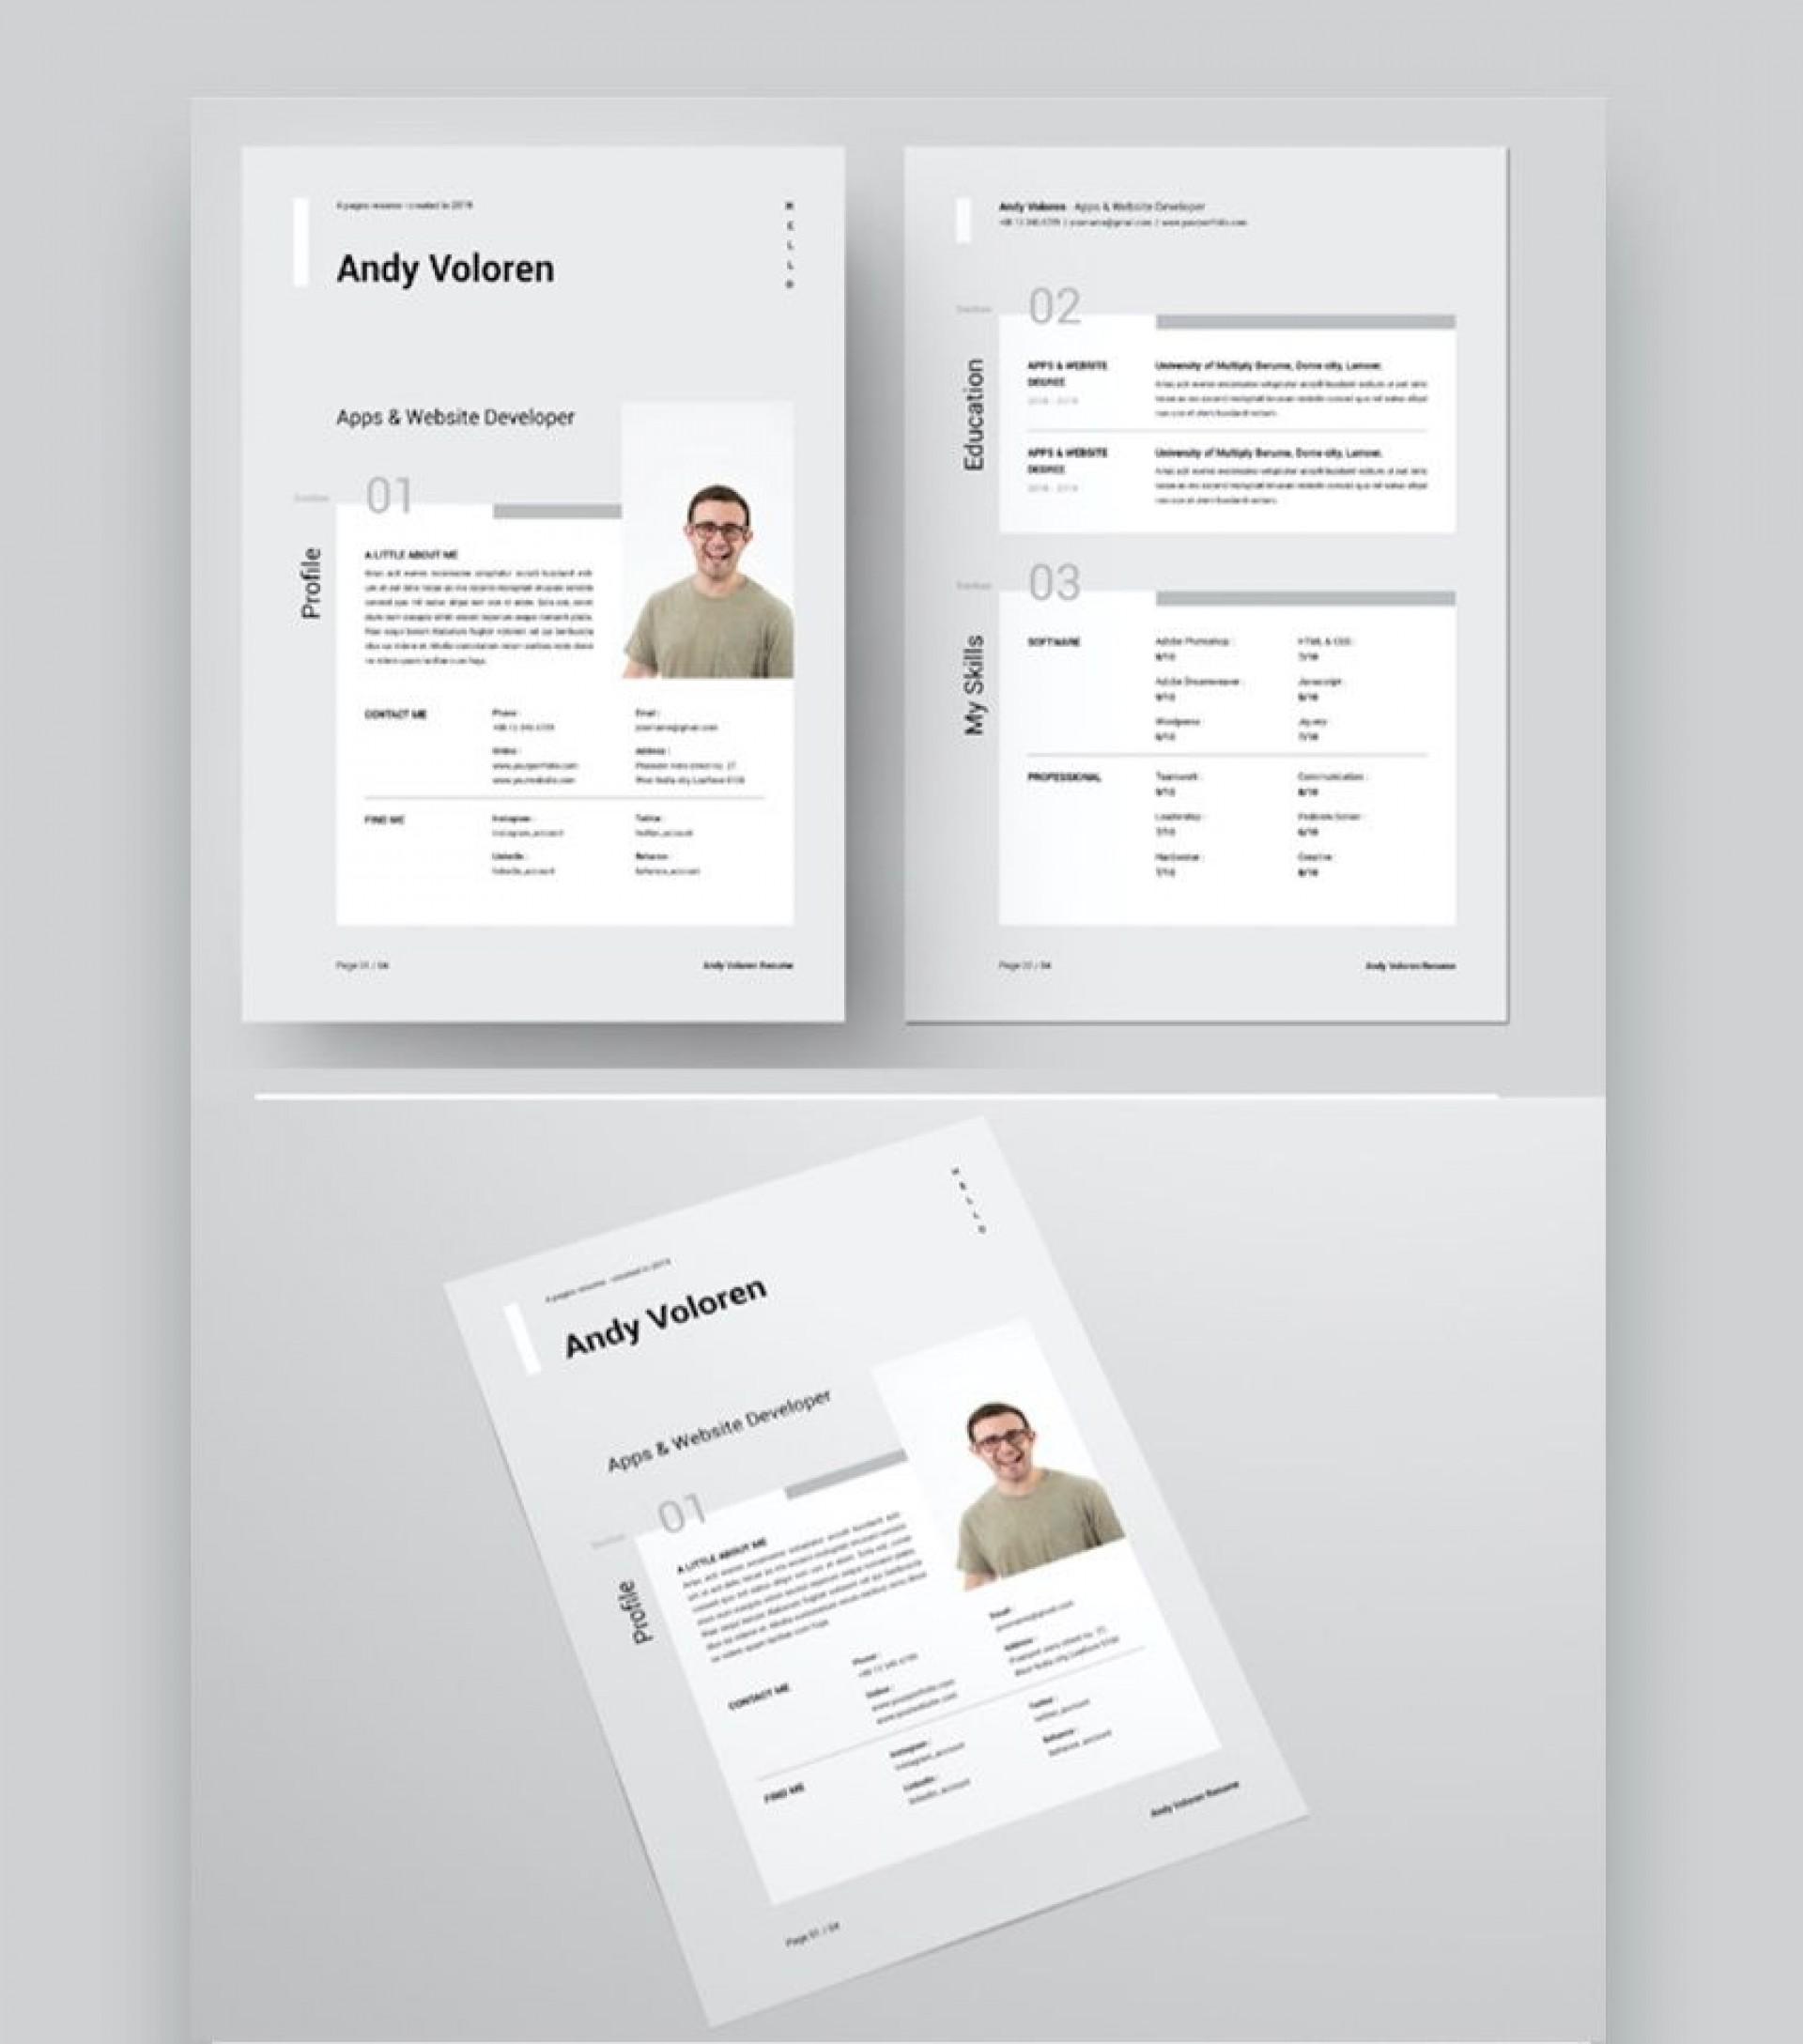 009 Imposing Microsoft Word Design Template Sample  Templates Brochure Free M1920